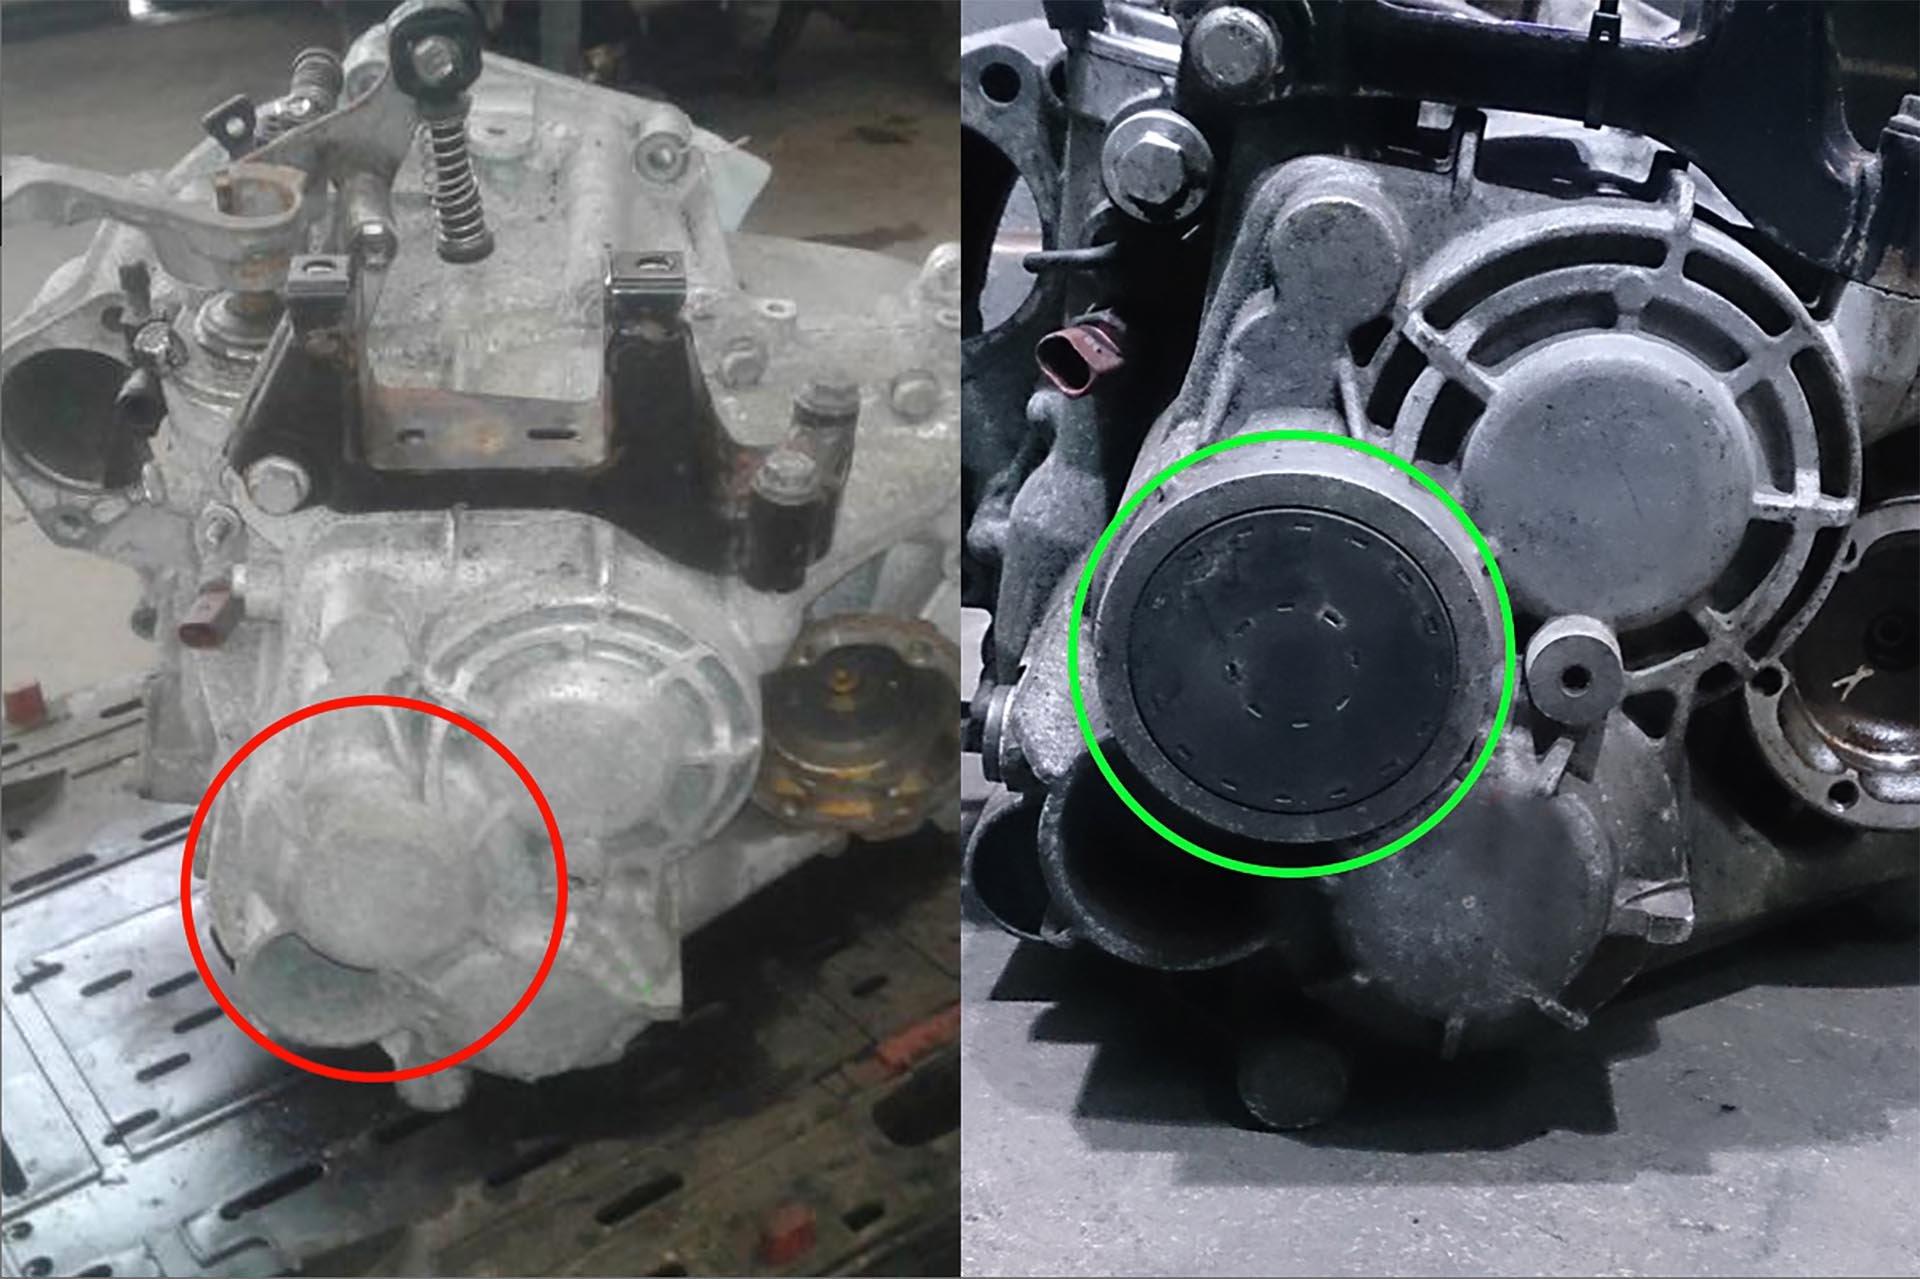 07_VW 02Q Mk5 transmission with input shaft cap